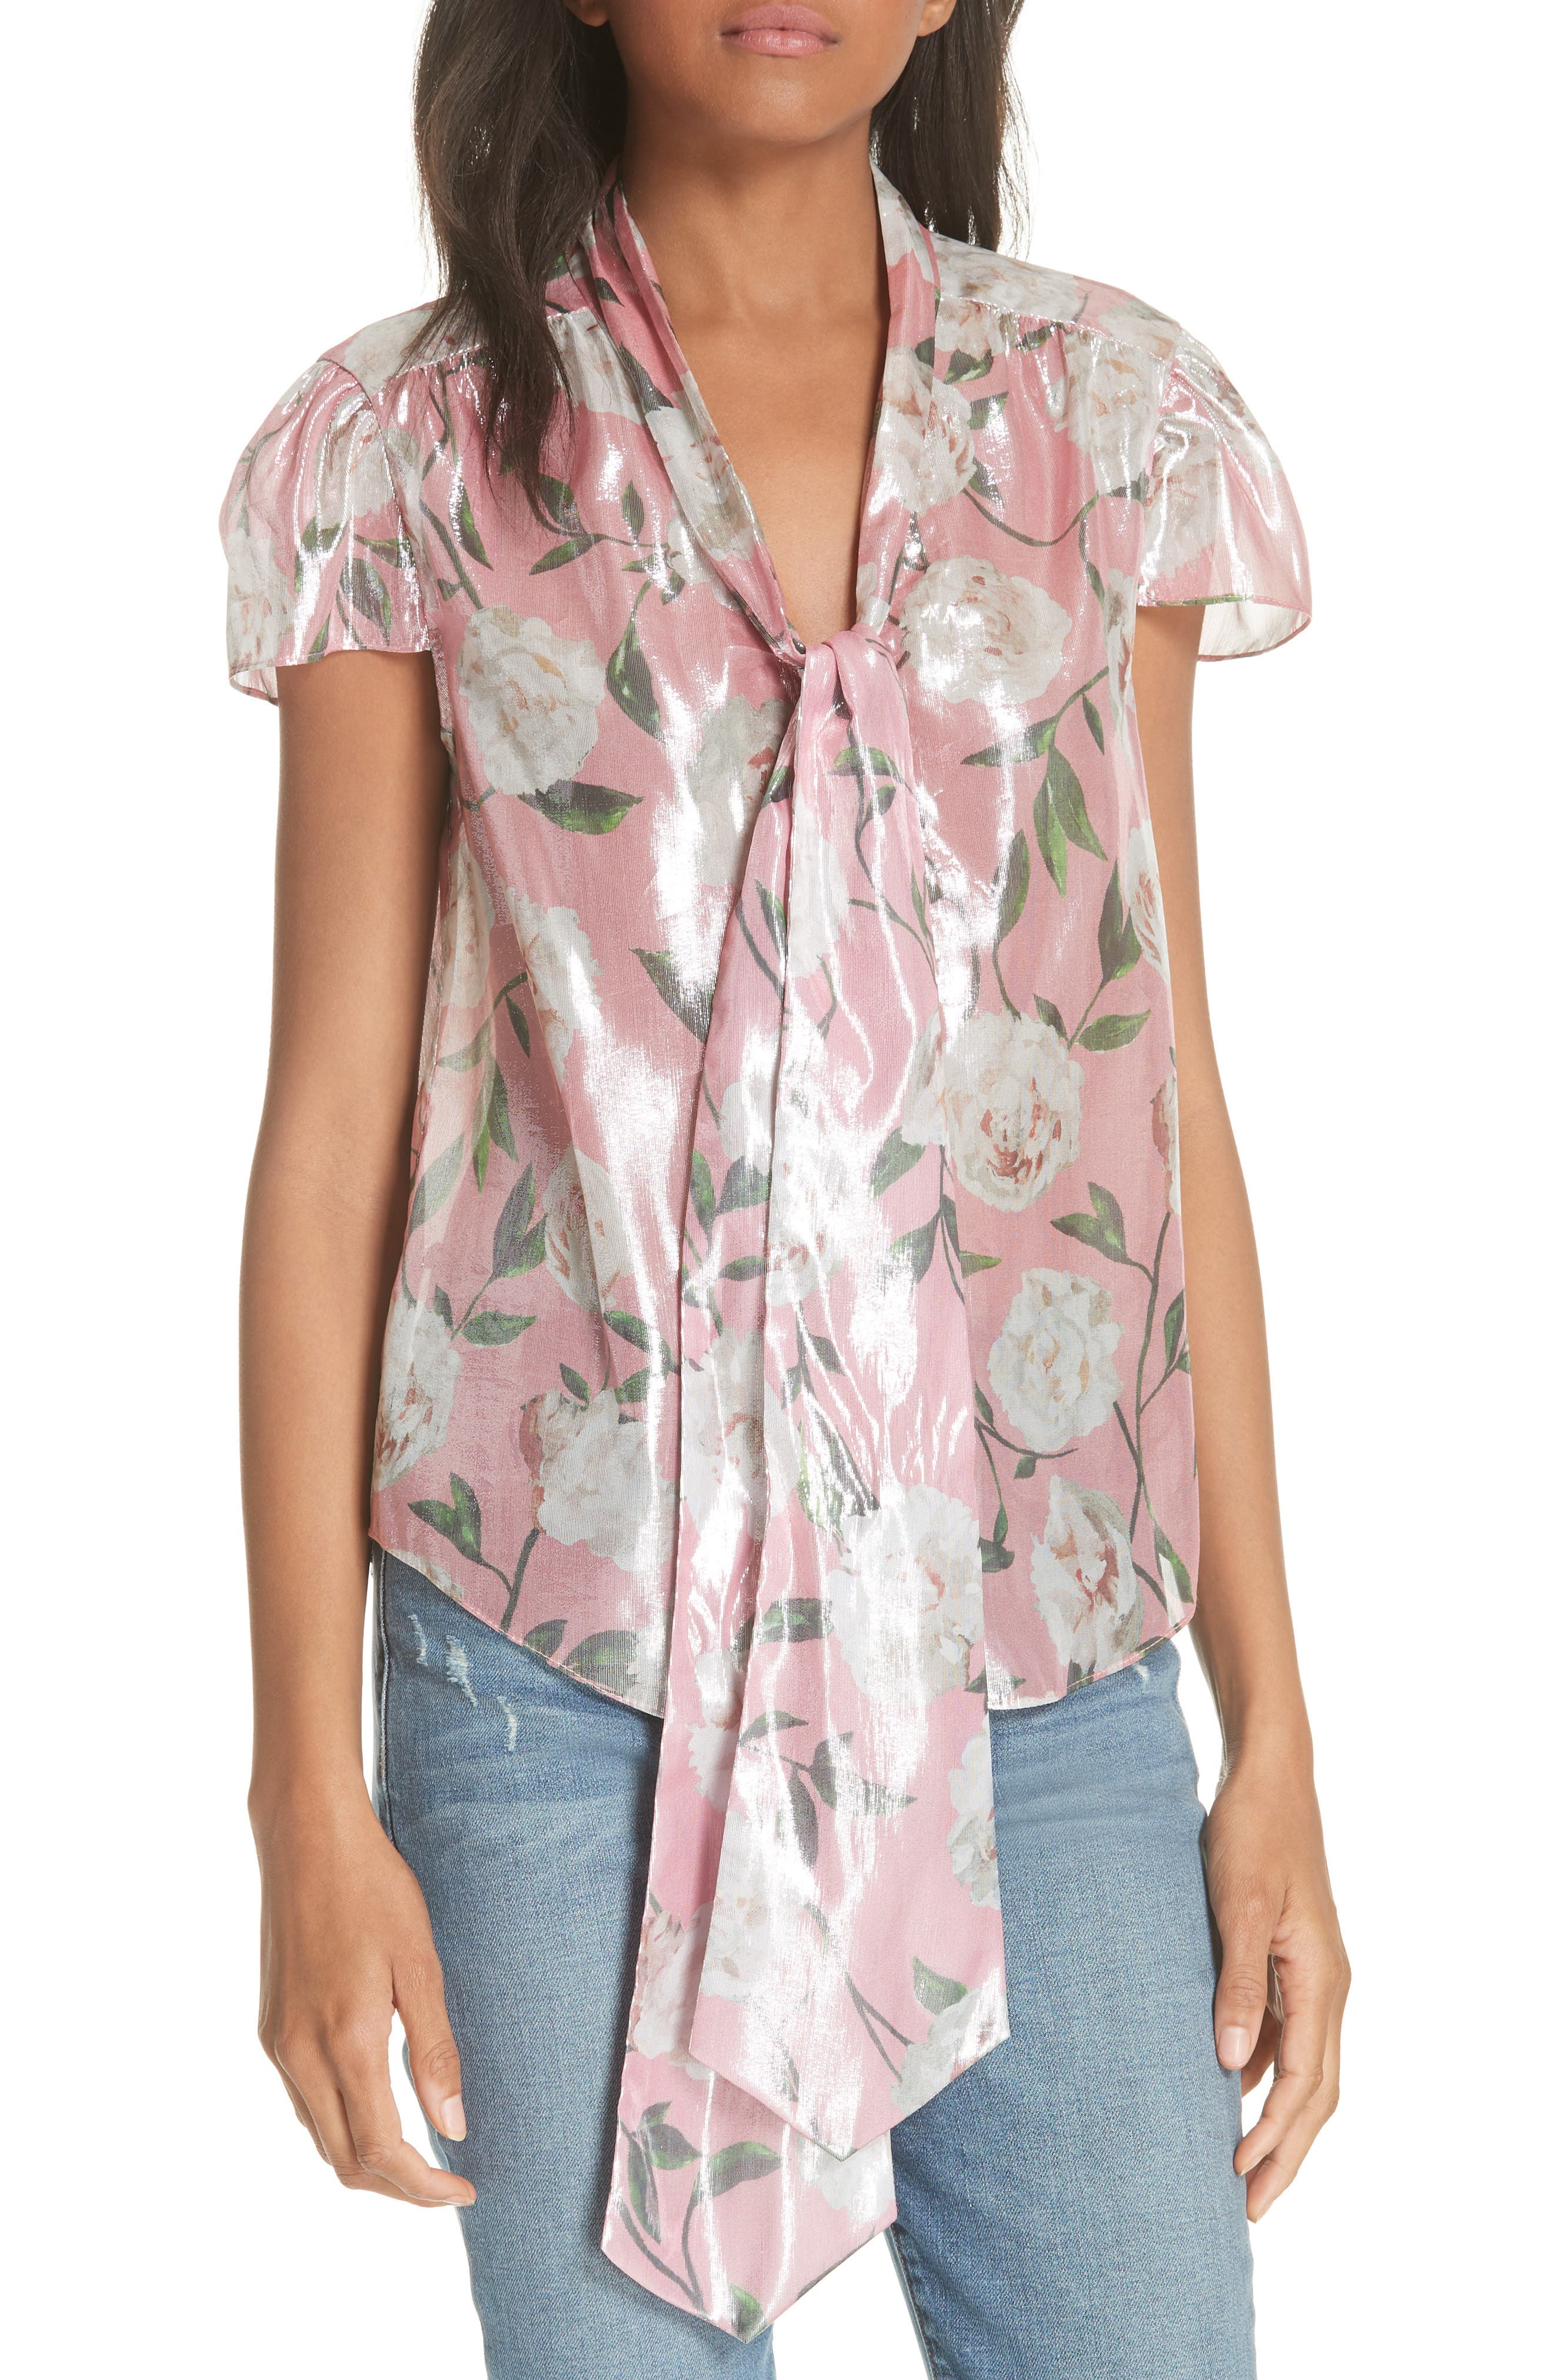 Jeannie Bow Collar Silk Blend Top,                             Main thumbnail 1, color,                             Peony Garden Wall/ Bubblegum